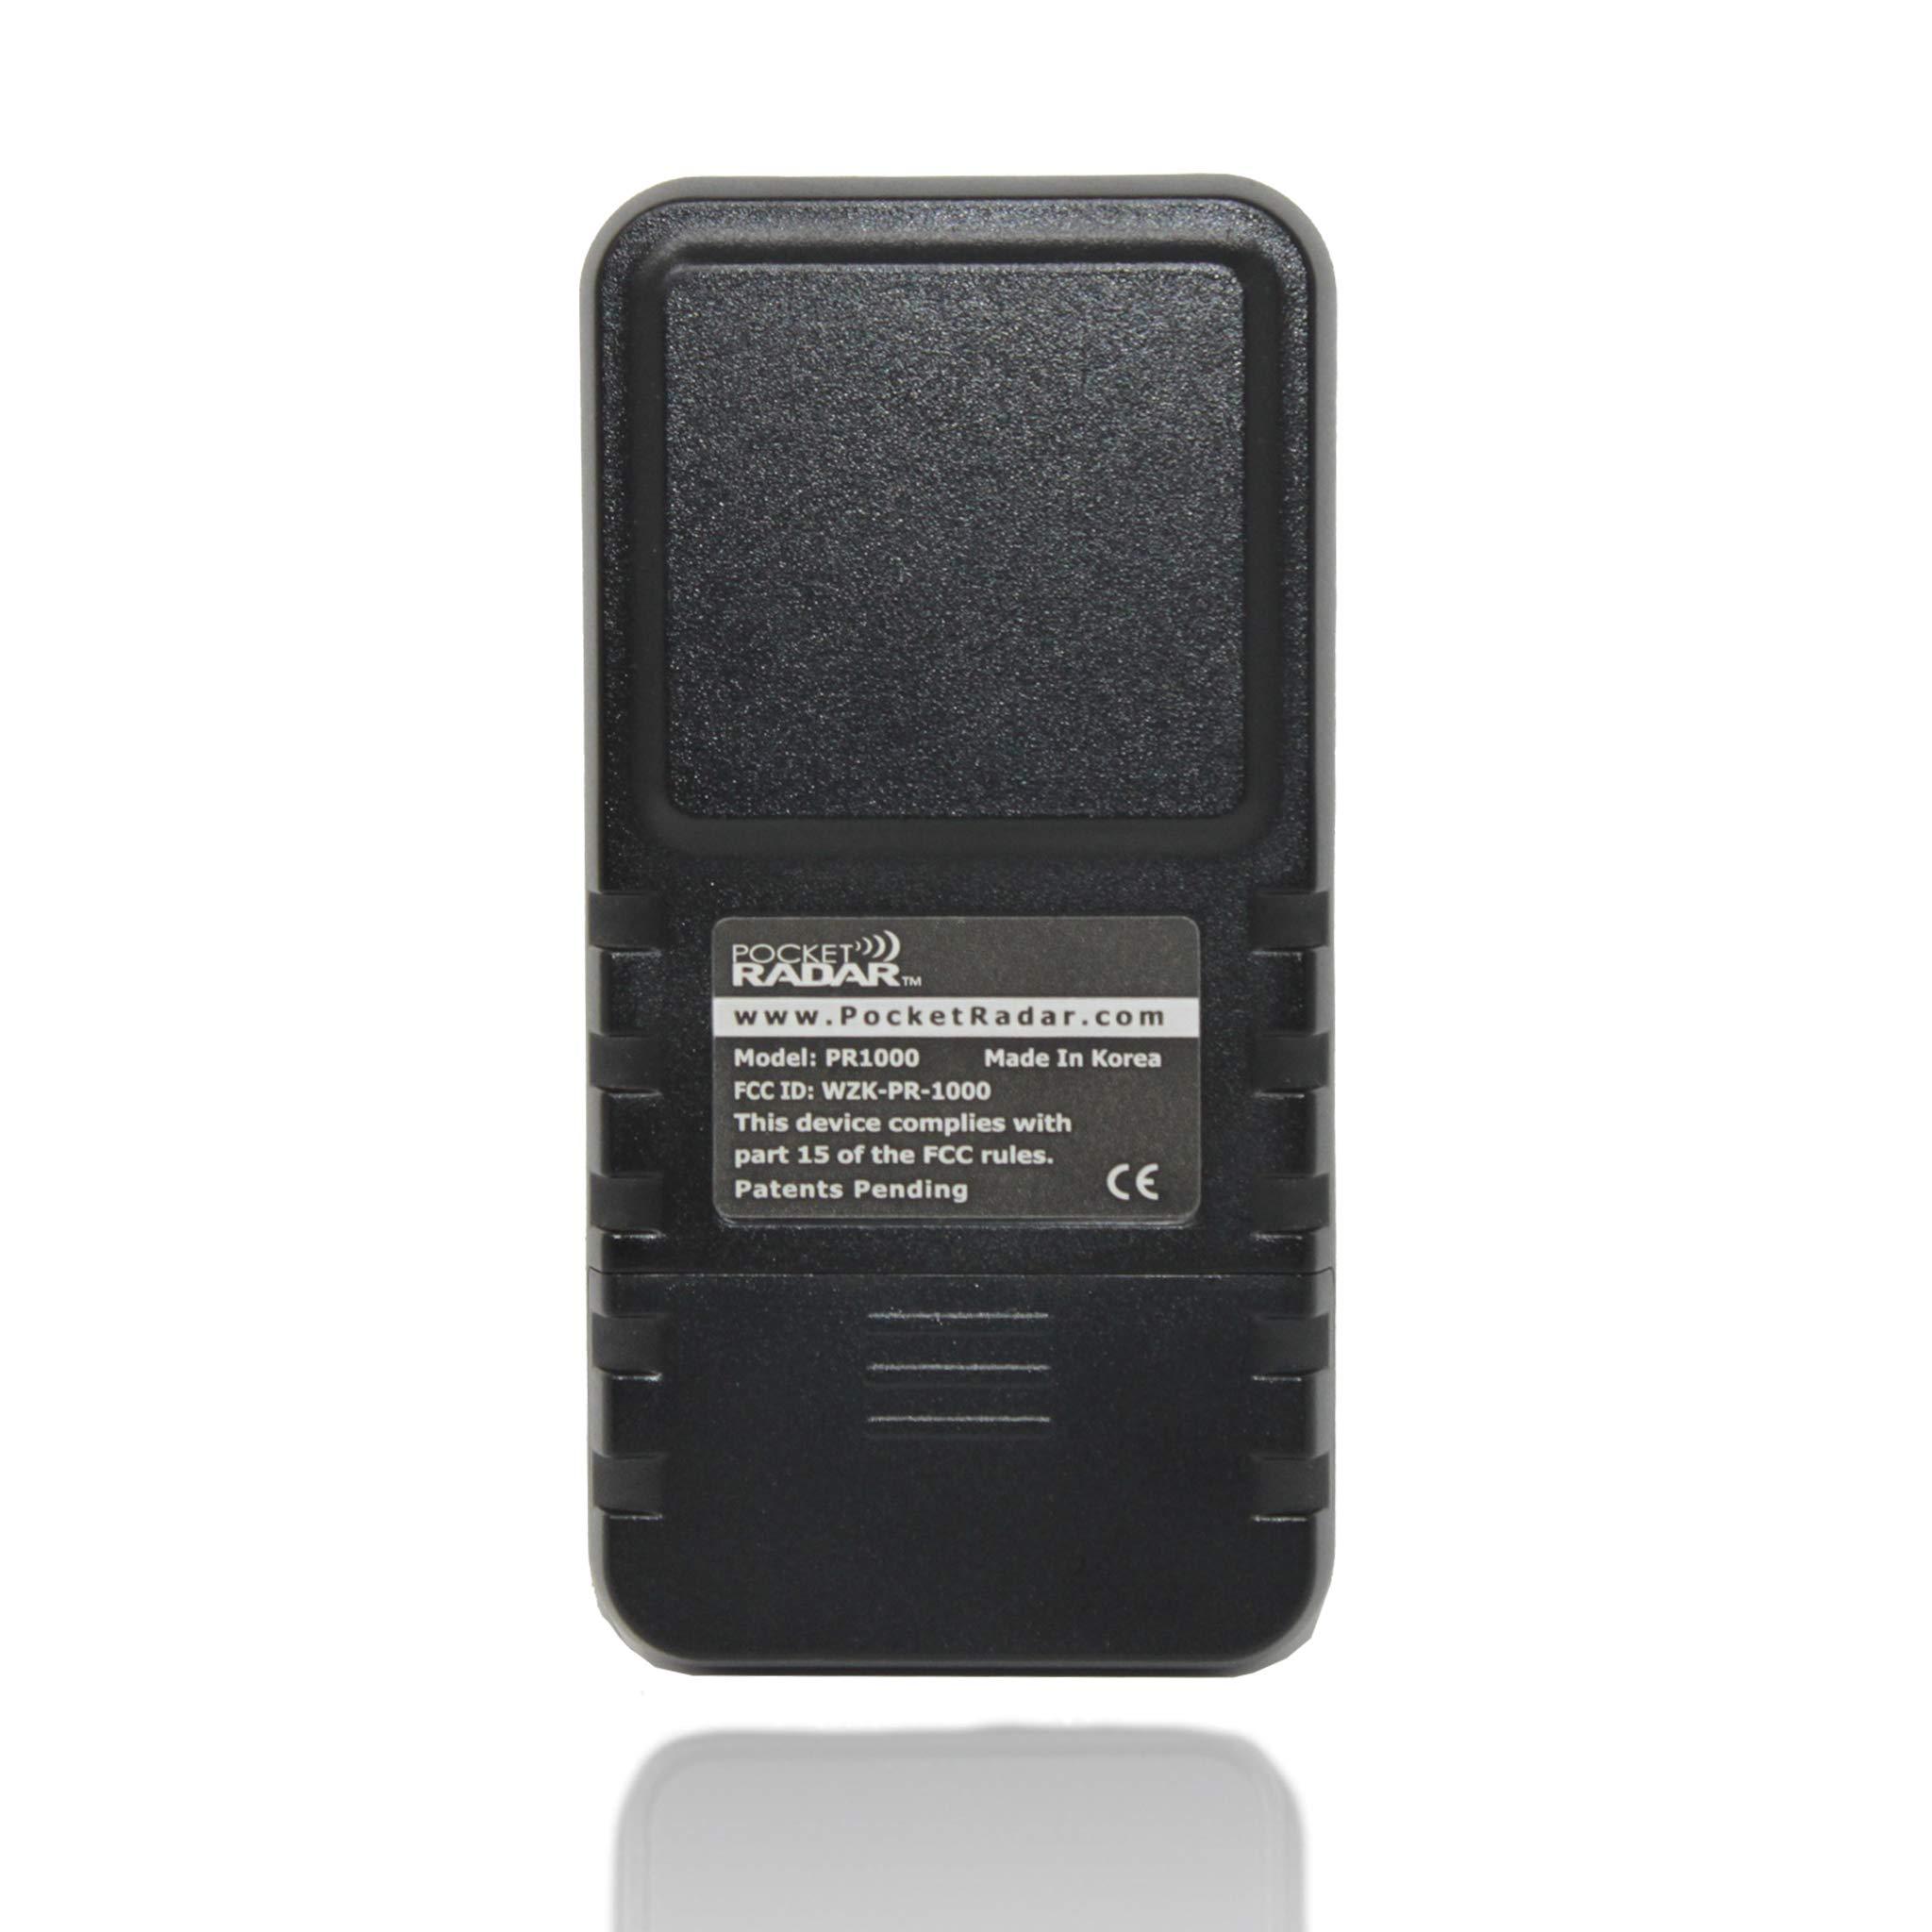 Pocket Radar Personal Speed Radar by Pocket Radar (Image #3)